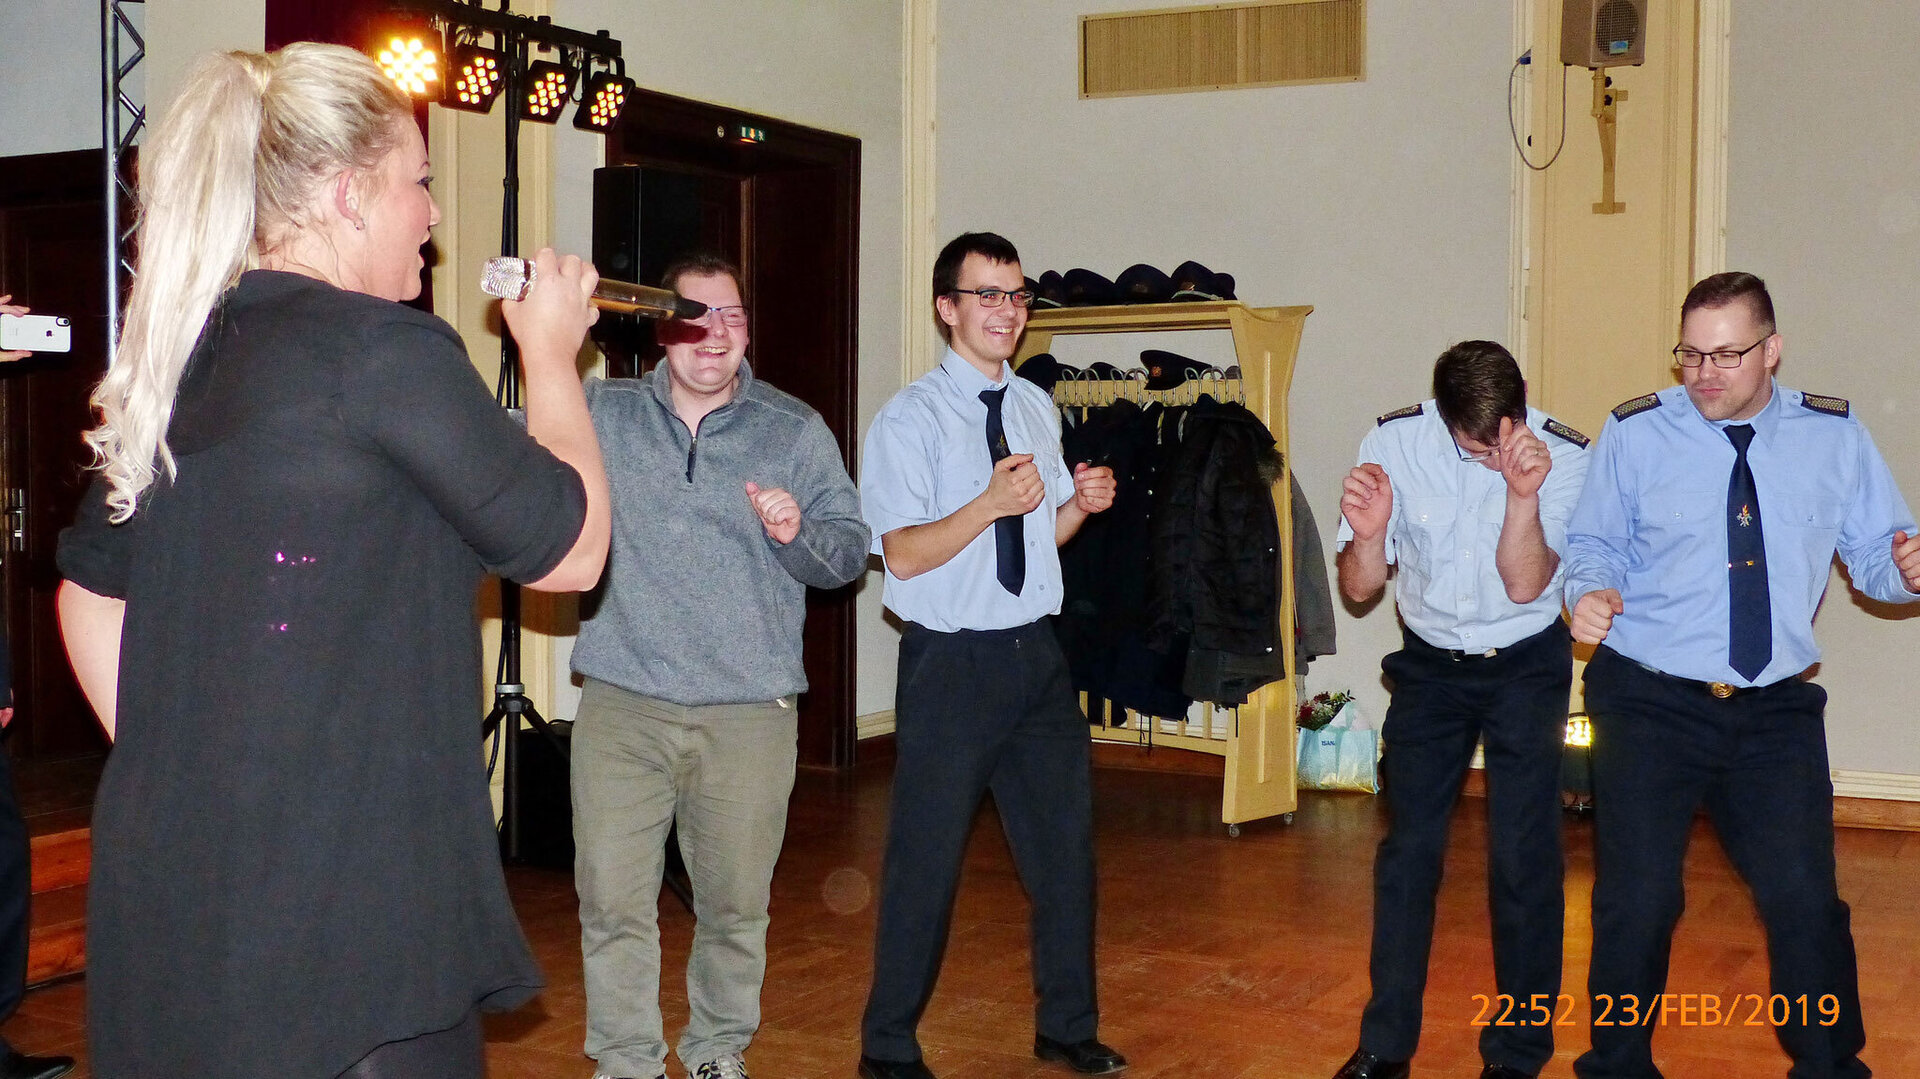 Tanzende Kameraden